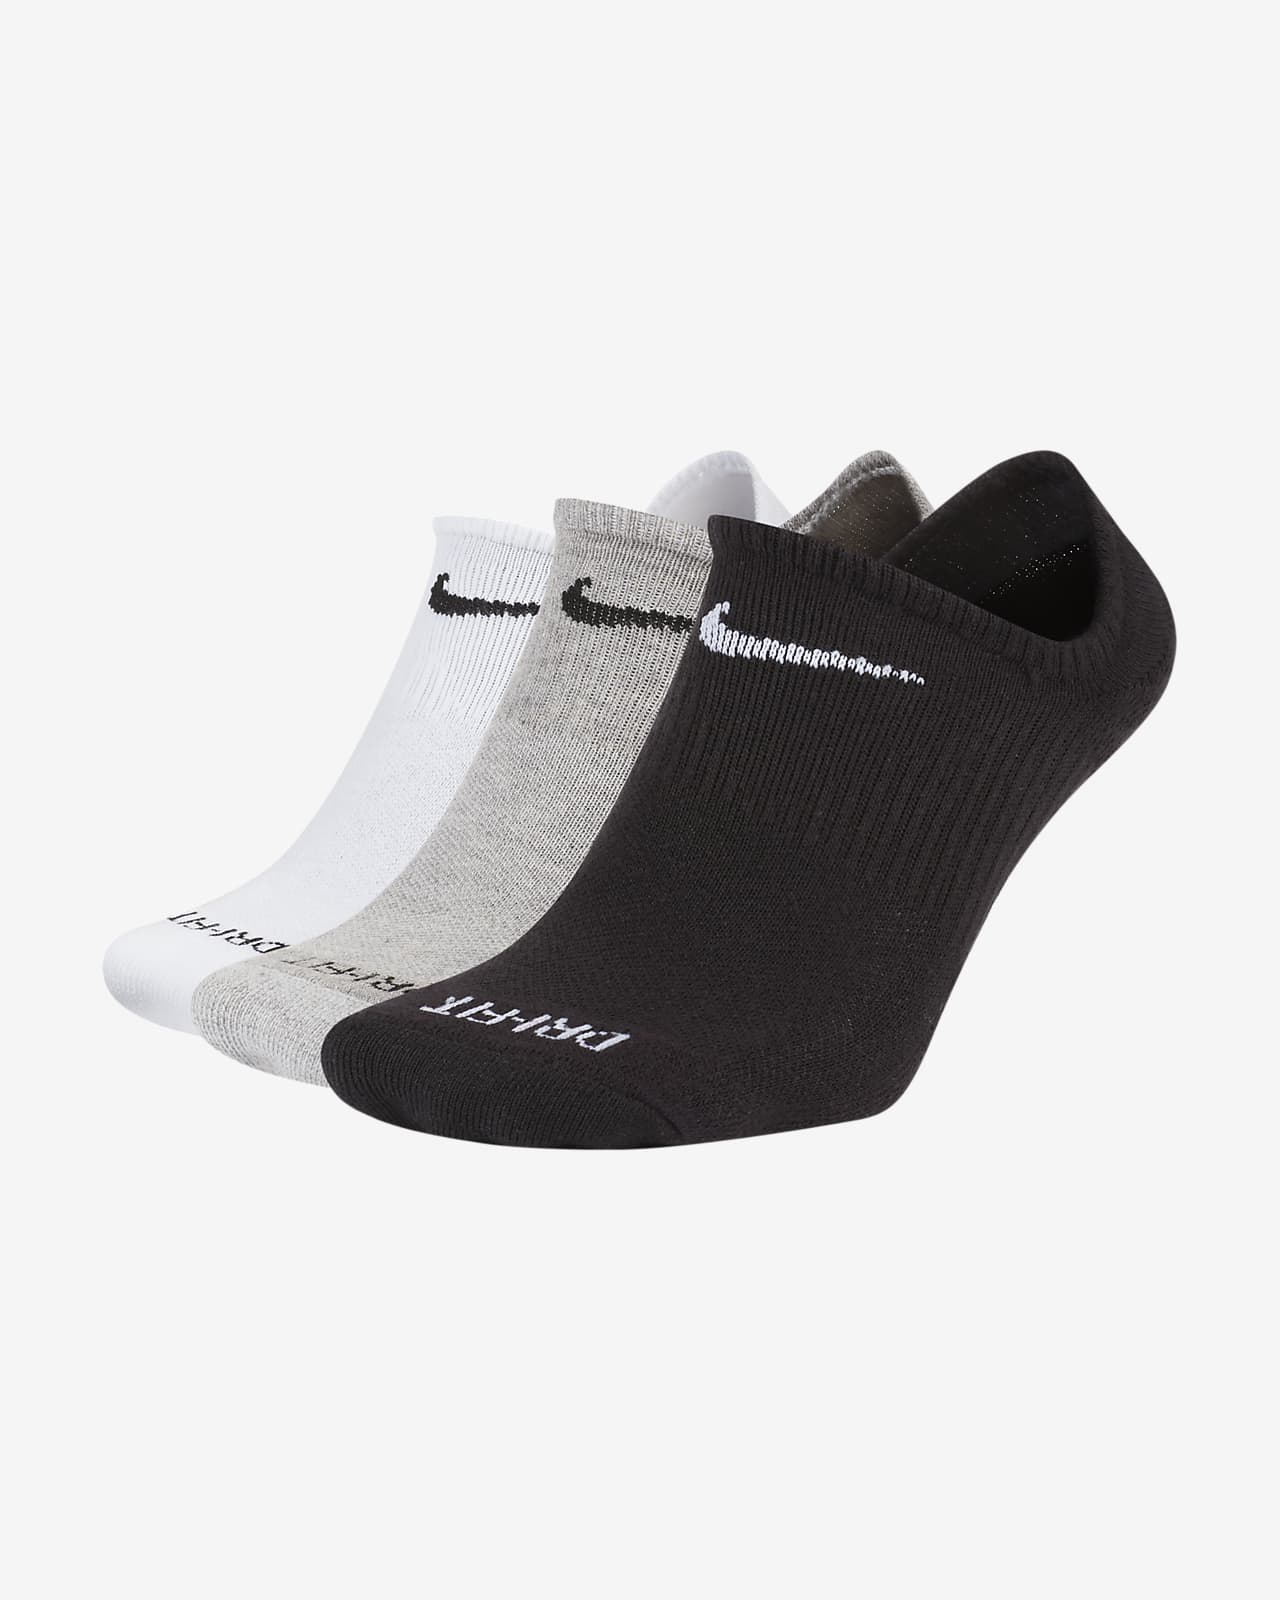 Träningsstrumpor Nike Everyday Plus Cushioned No-Show (3 par)